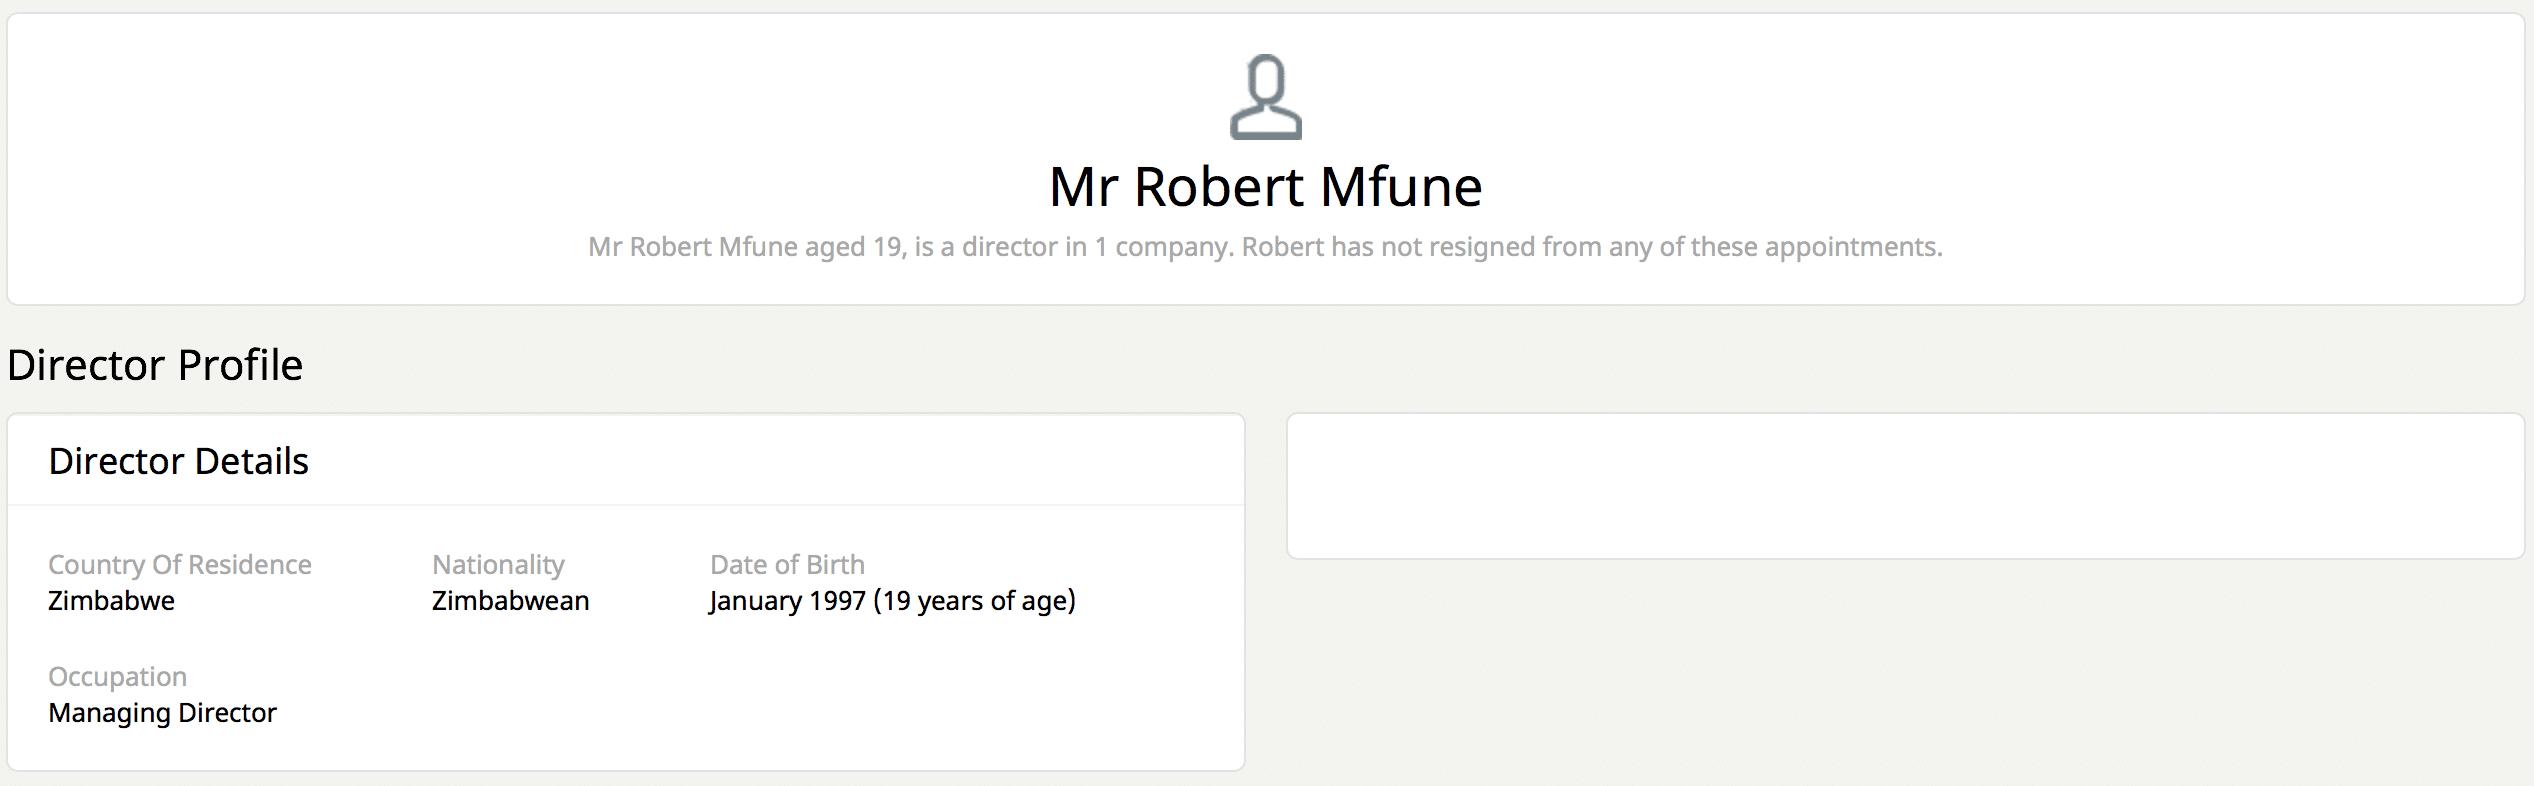 Robert Mfune